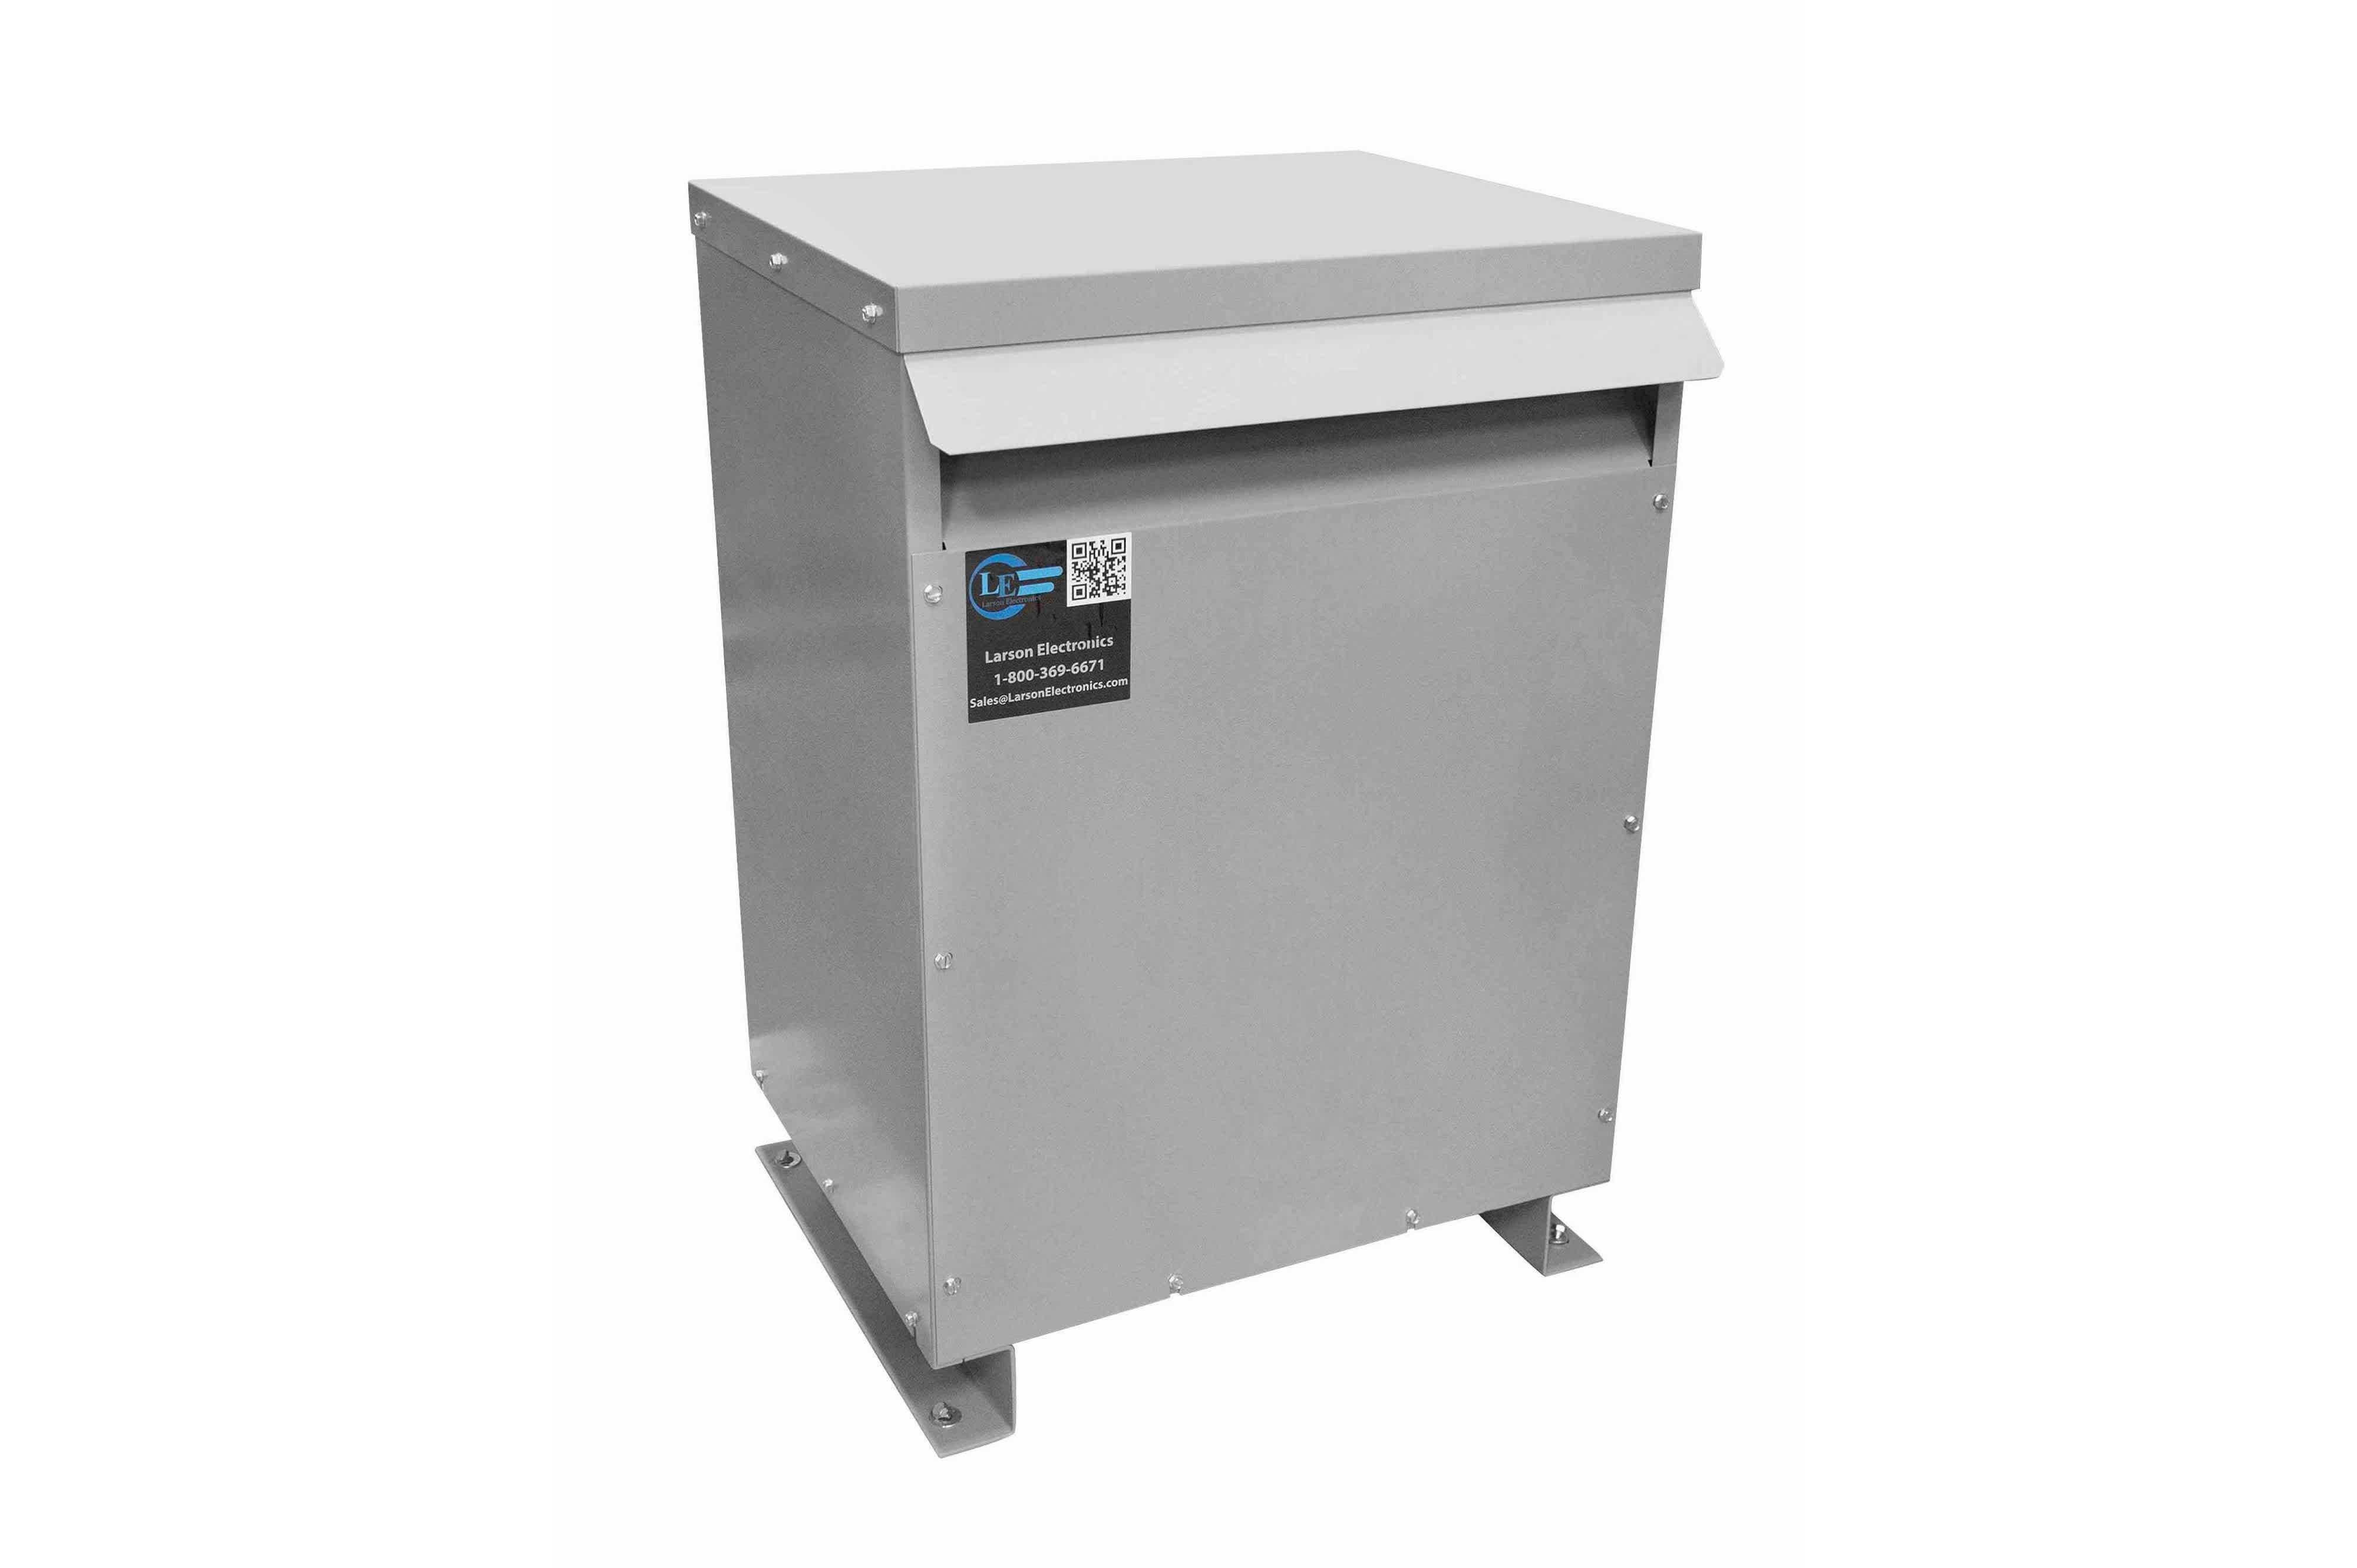 32.5 kVA 3PH Isolation Transformer, 480V Wye Primary, 240V/120 Delta Secondary, N3R, Ventilated, 60 Hz